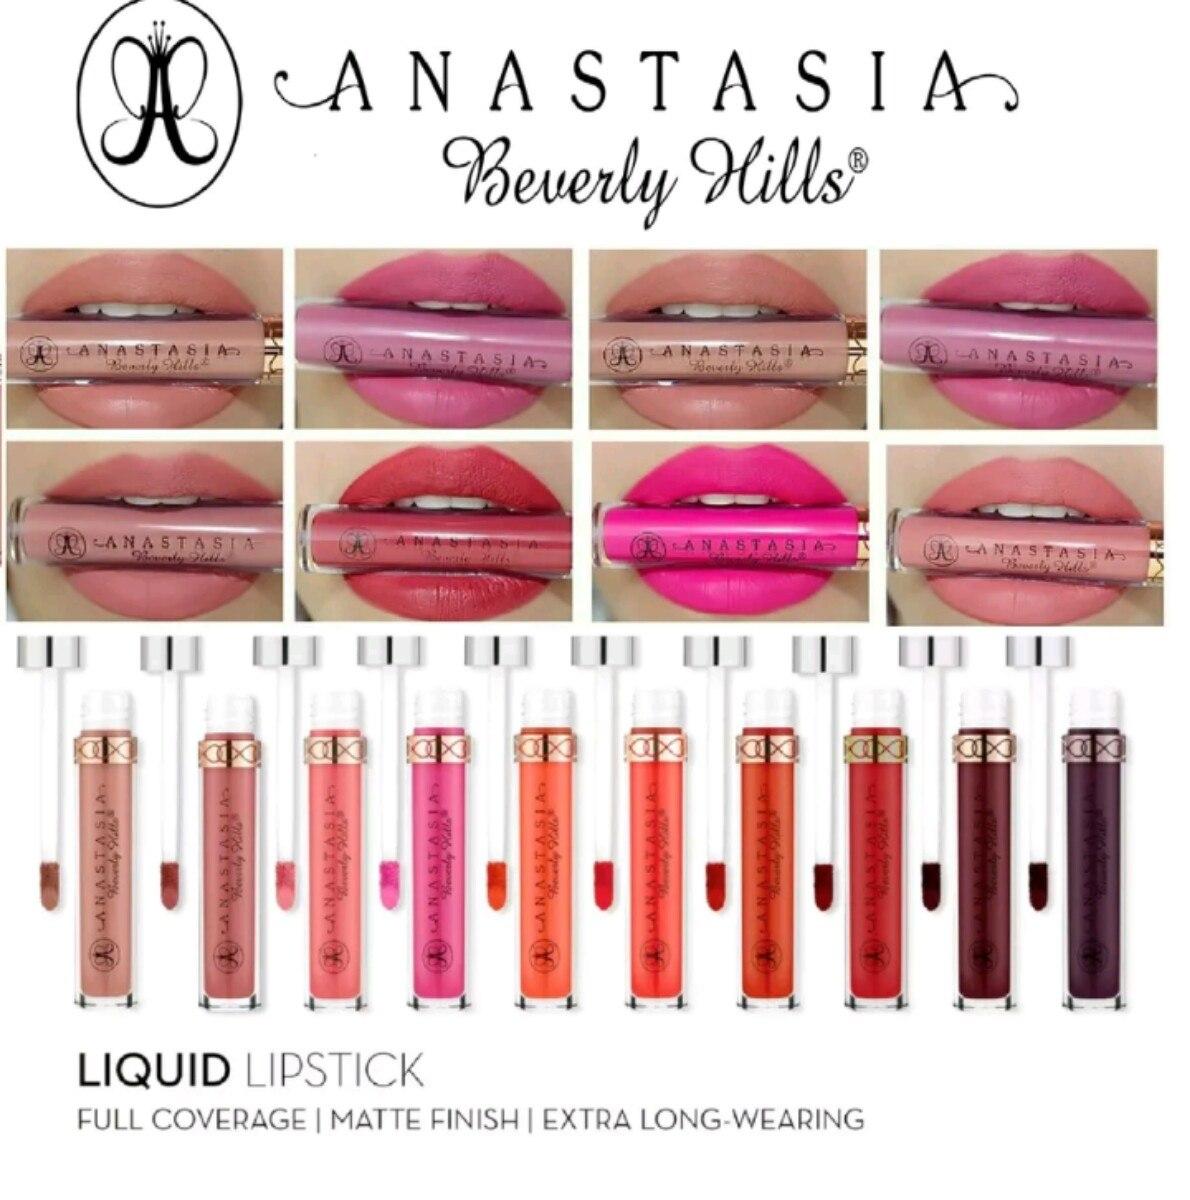 Lipgloss Mate De Anastasia Beverly Hills En 43 Colores